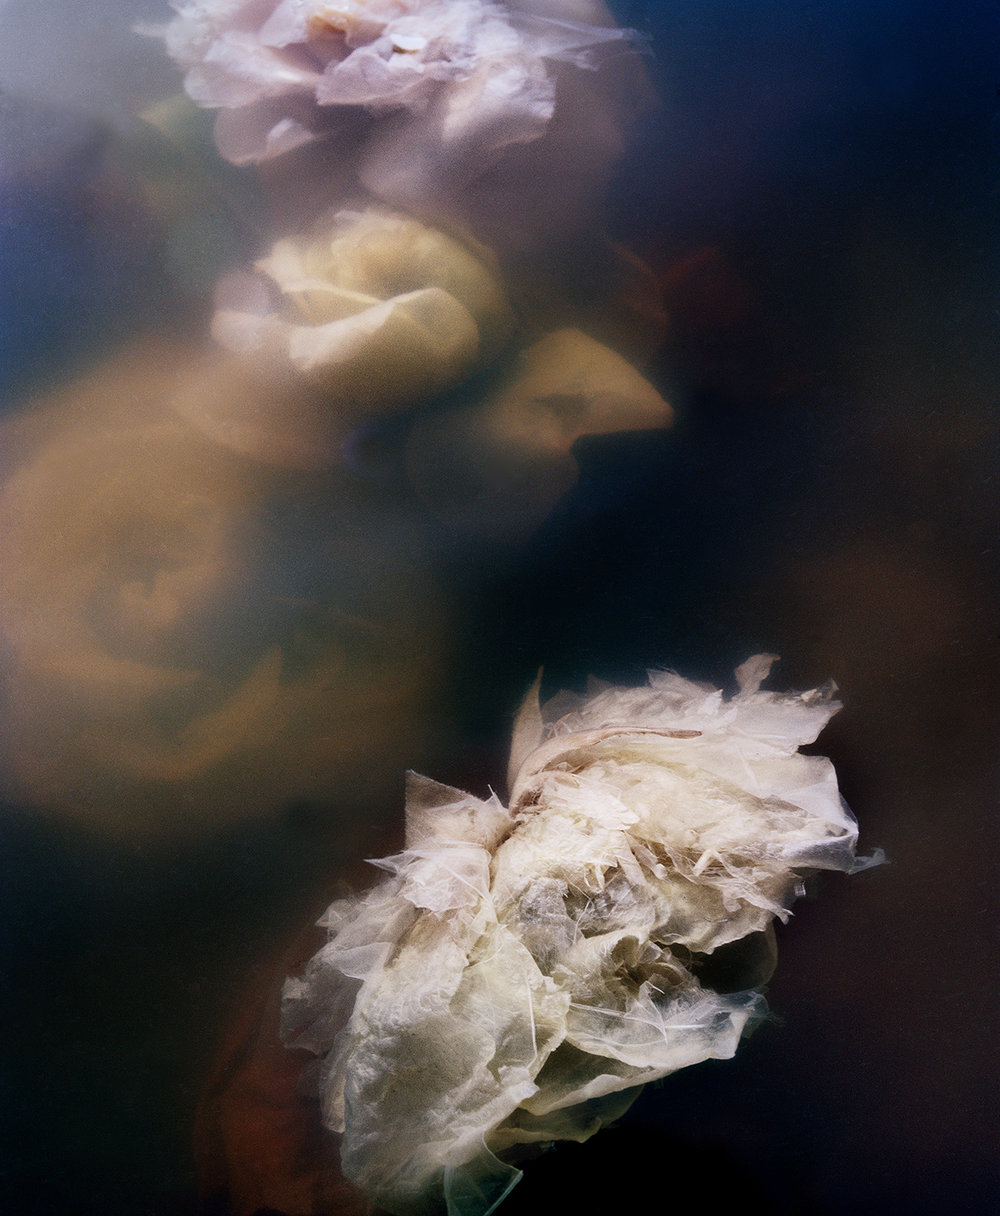 Dark Matter #12 (White Sinking Rose)